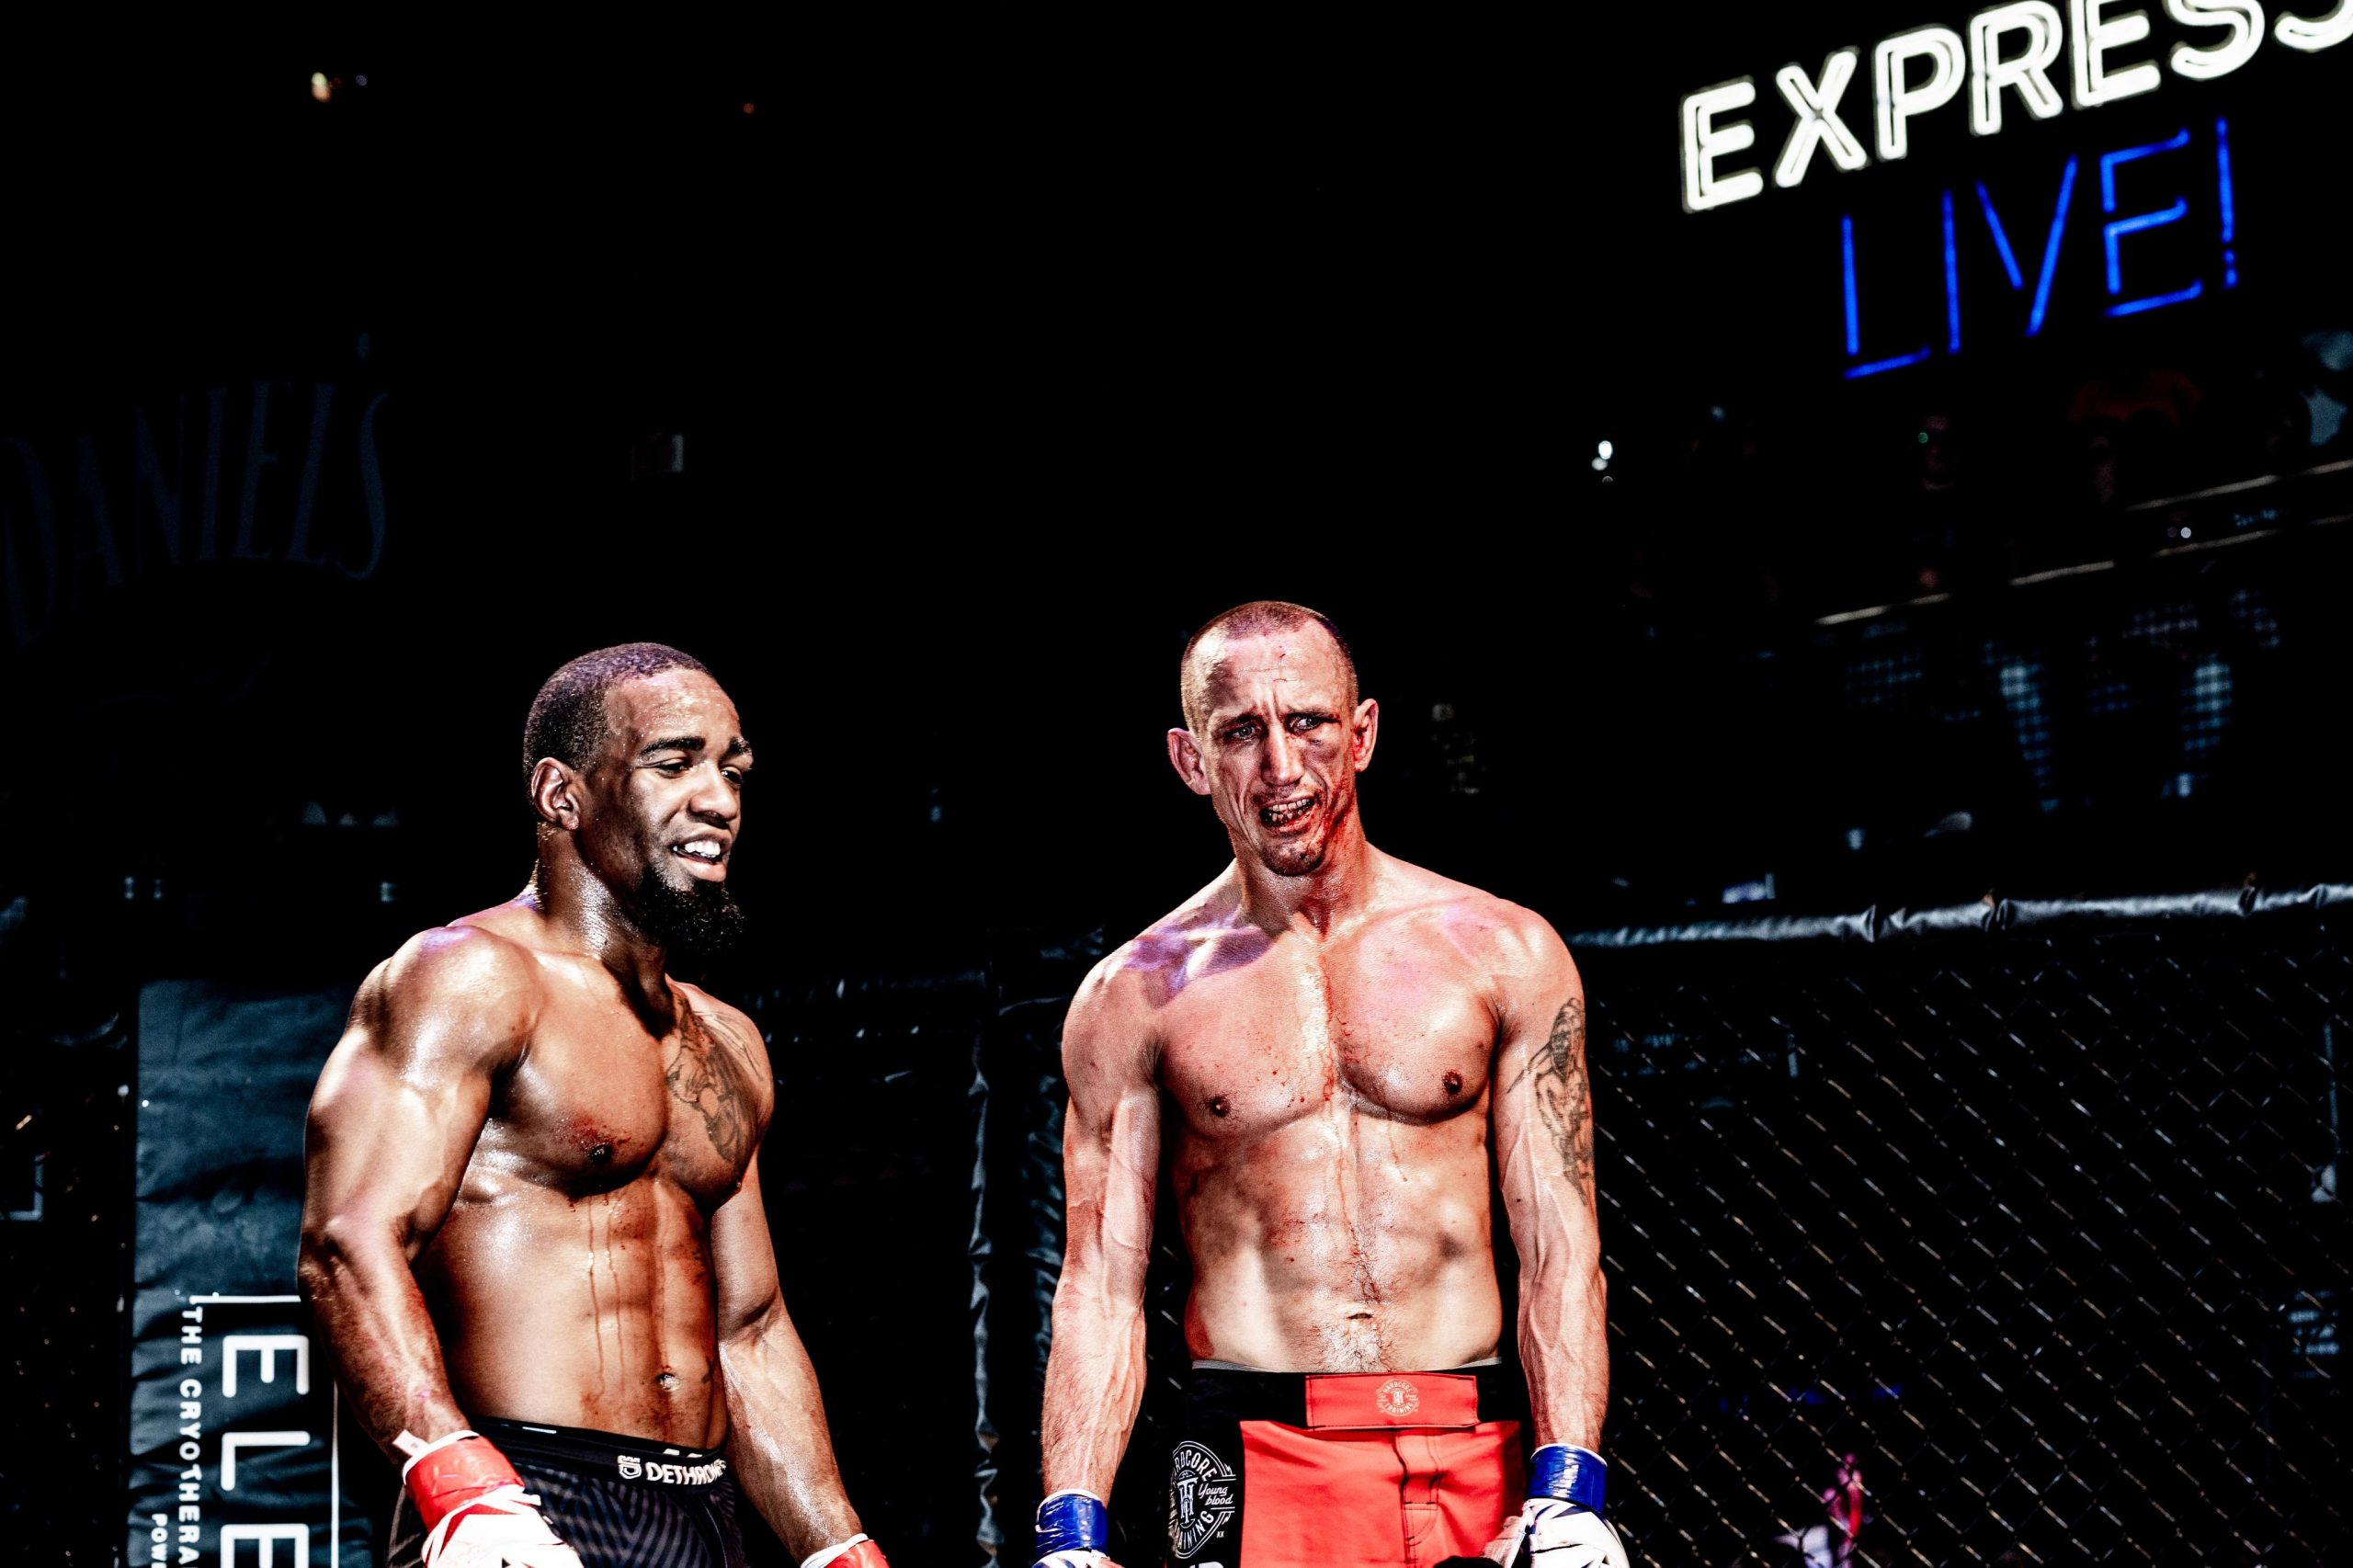 Alfred Leisure (right) vs. Corey Dulaney - Ohio Combat League 5 - Photo by Dave Hatfield (thelastwhitesquirrel)